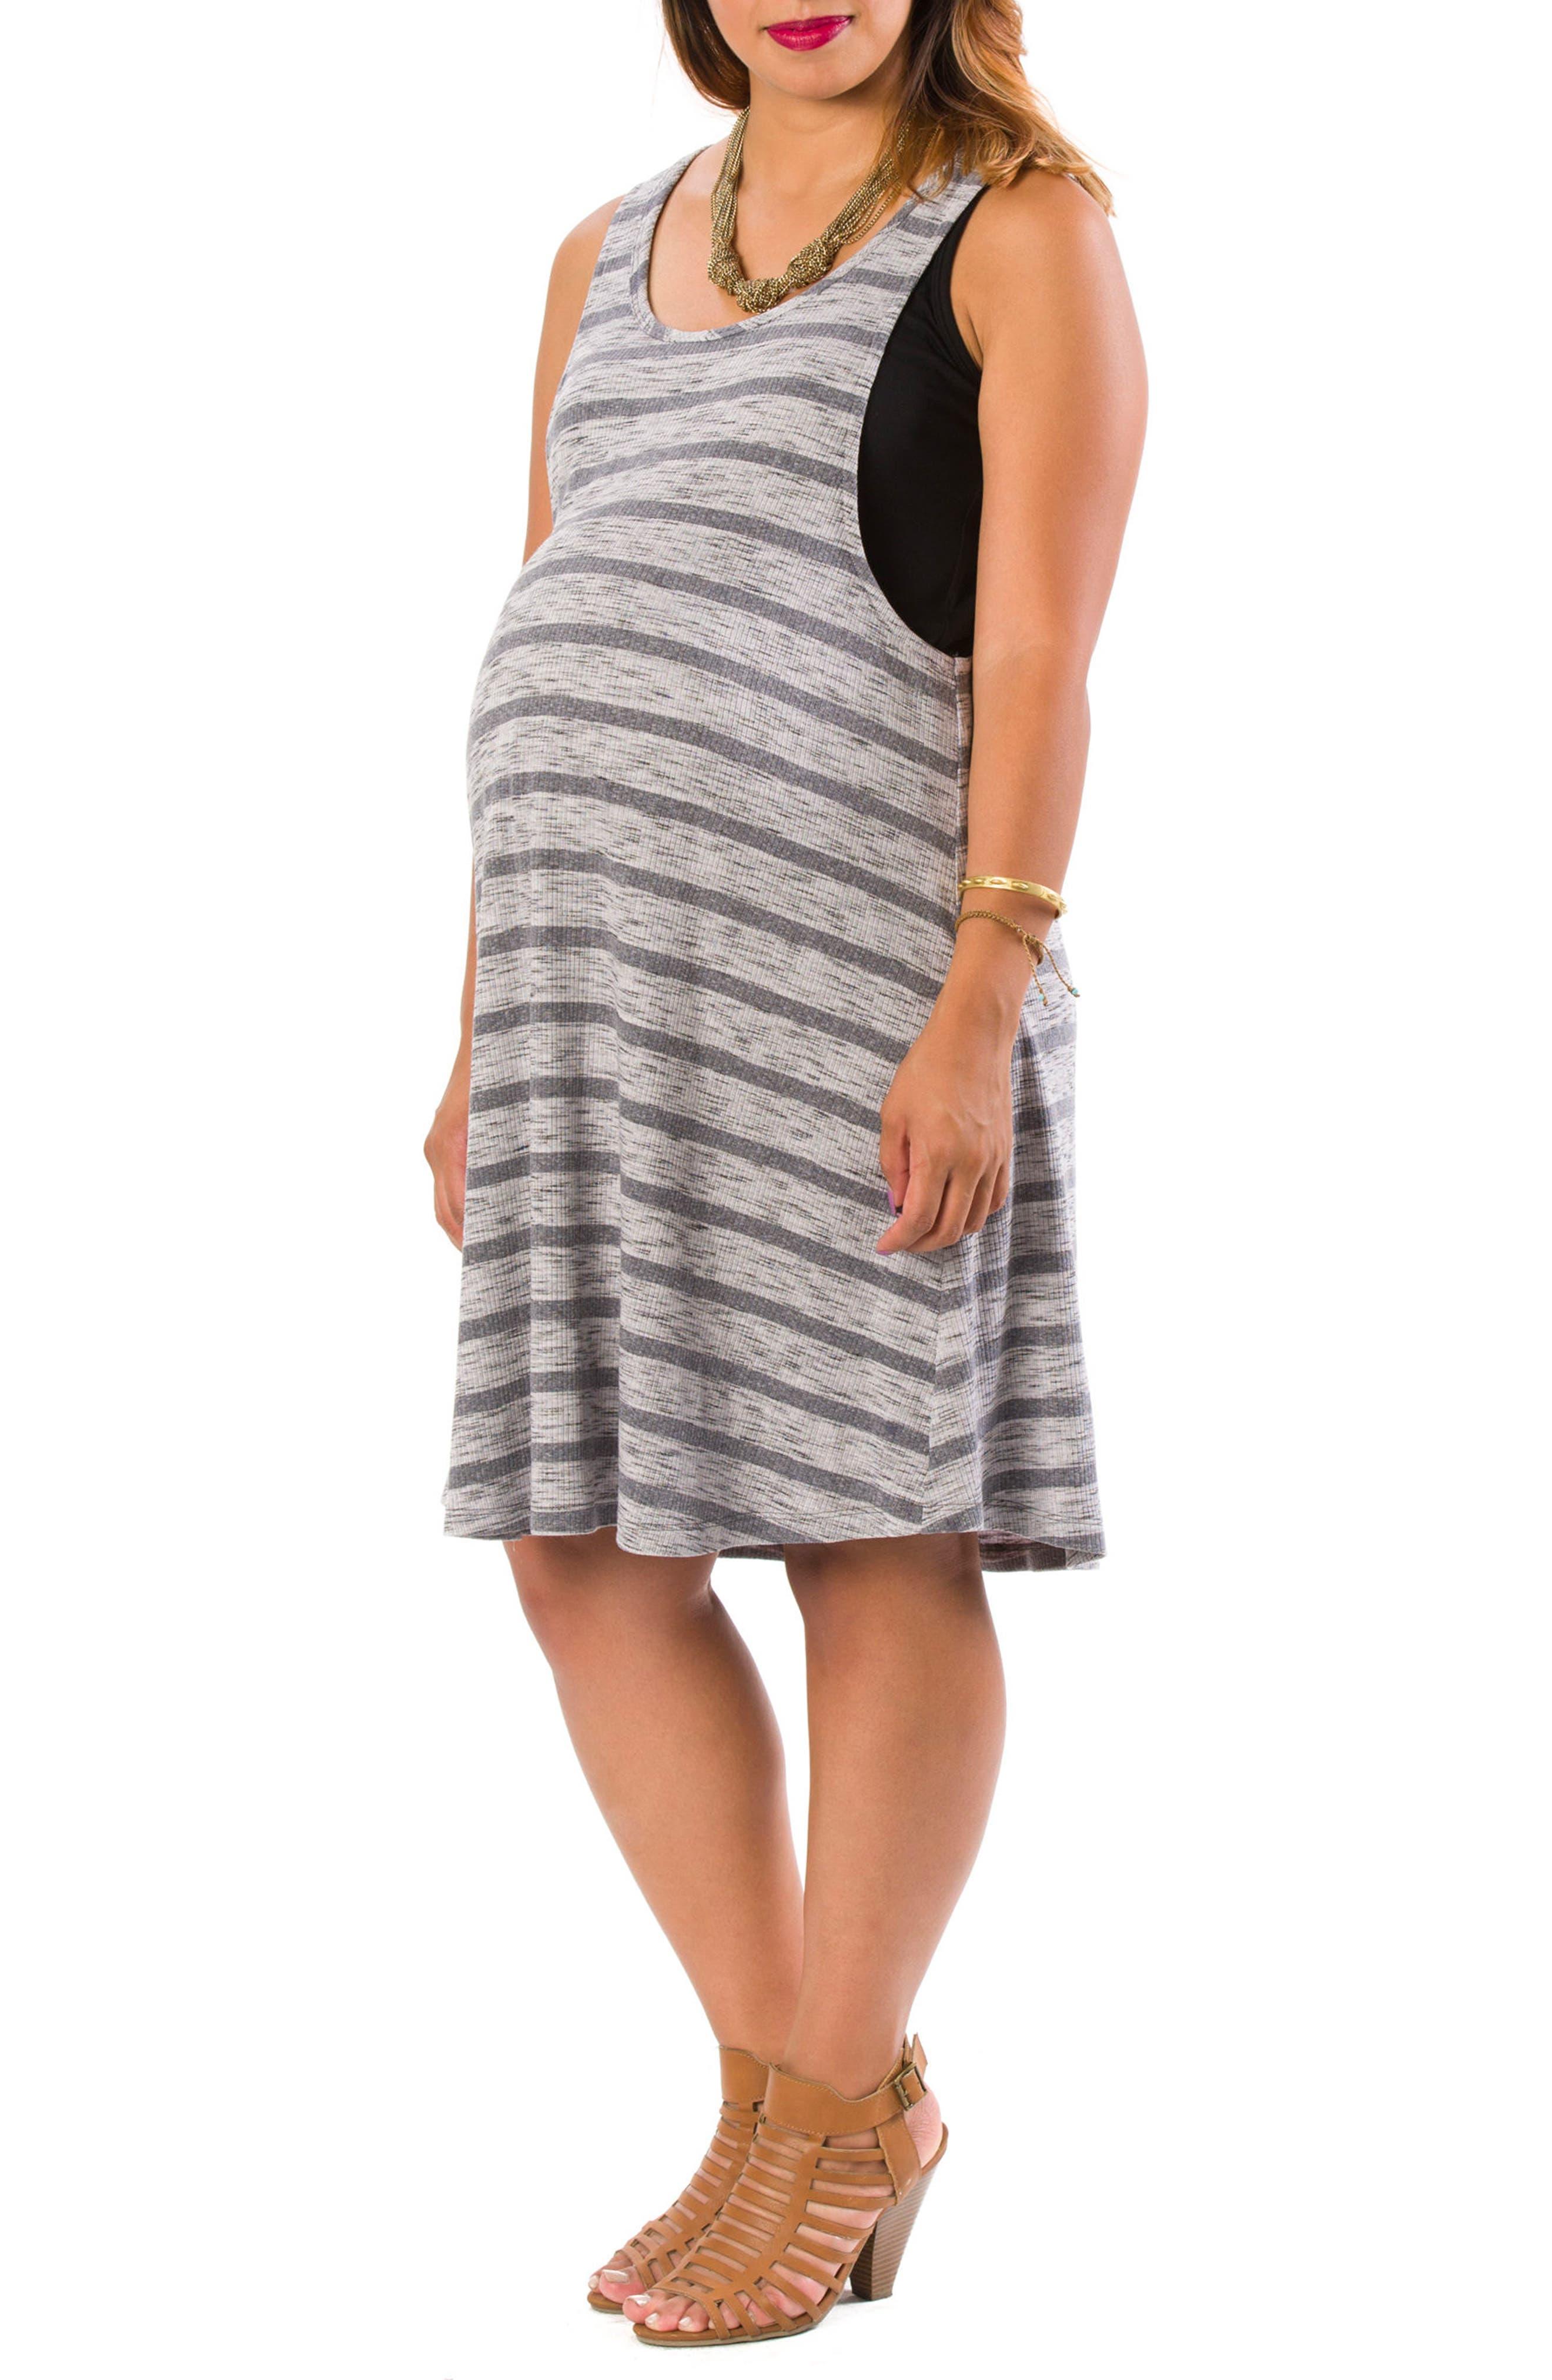 LAB40 Danielle Maternity/Nursing Tank Dress